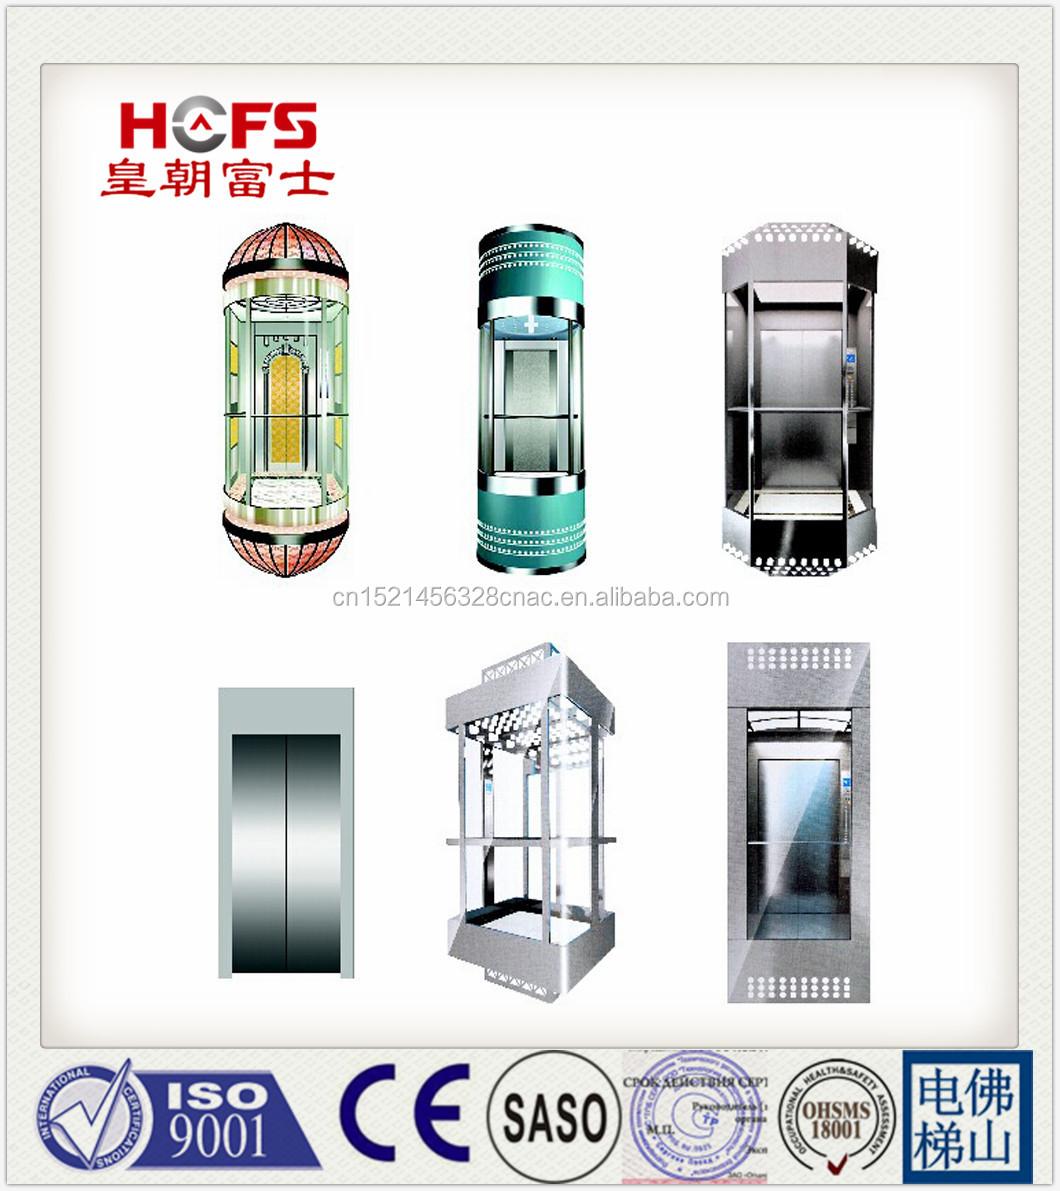 China Passenger Elevator Lifts In India, China Passenger Elevator